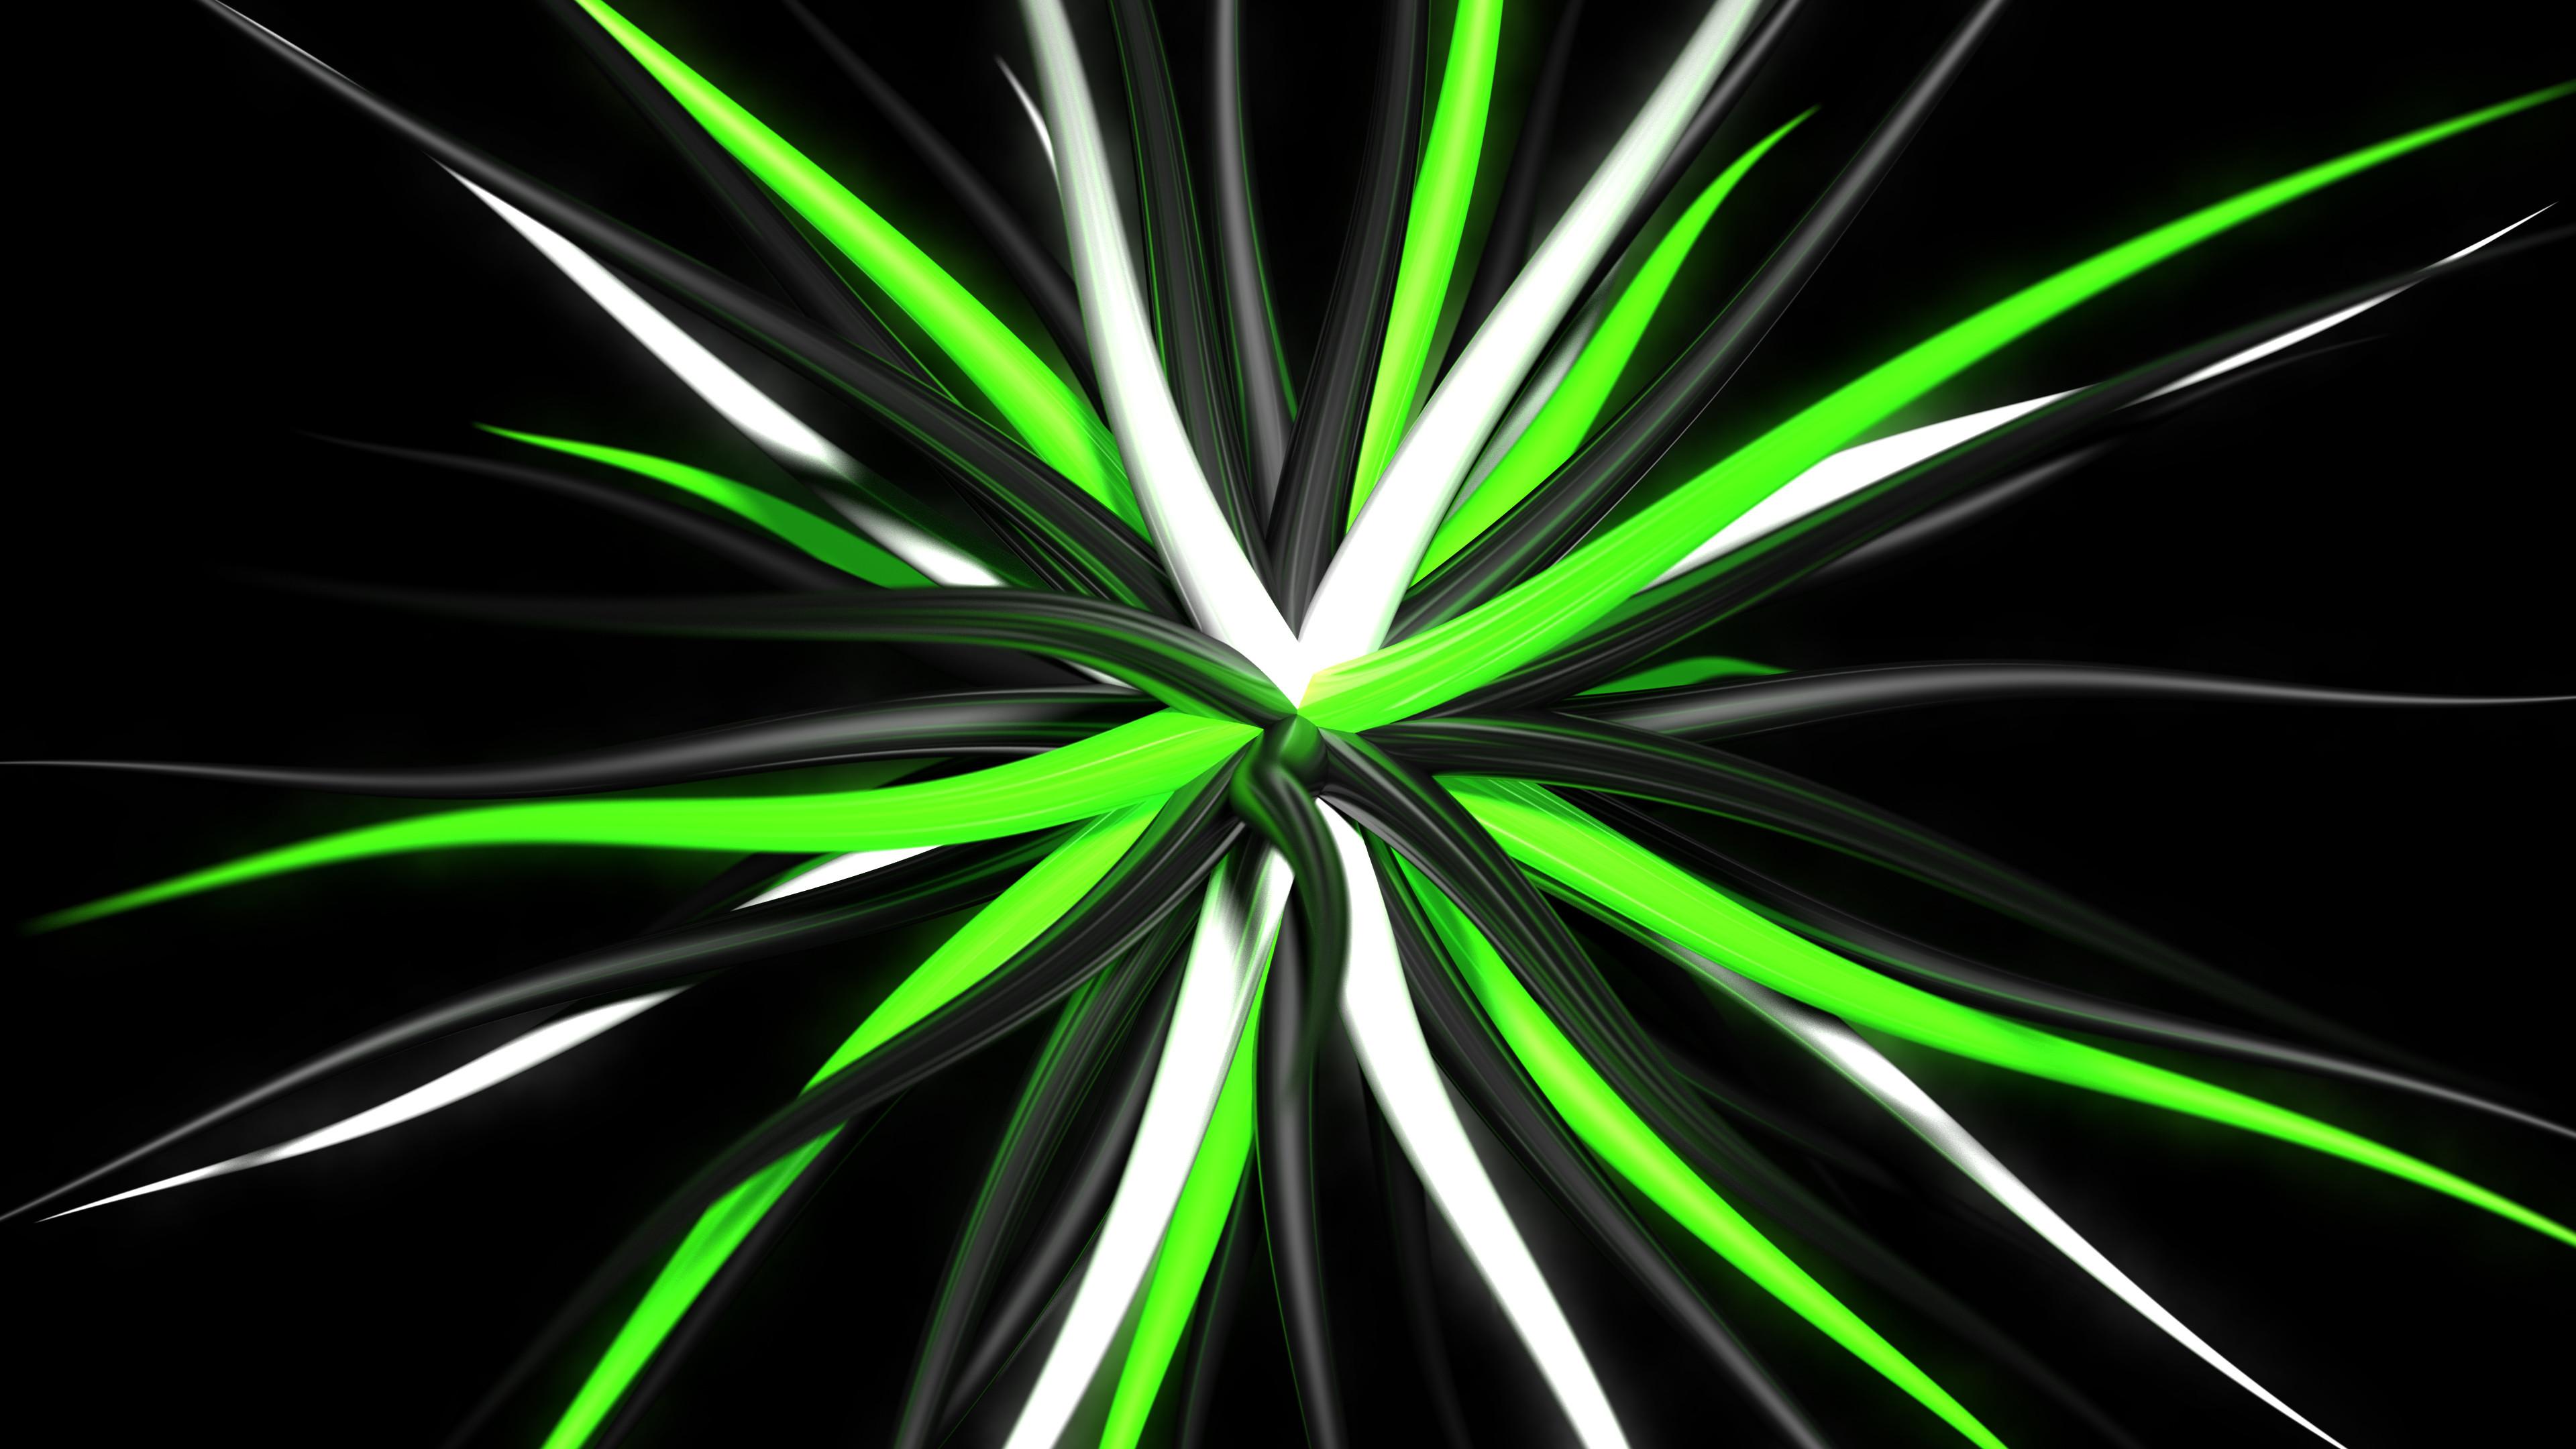 CGI – Cool Abstract Black White Green 3D Digital CGI Wallpaper